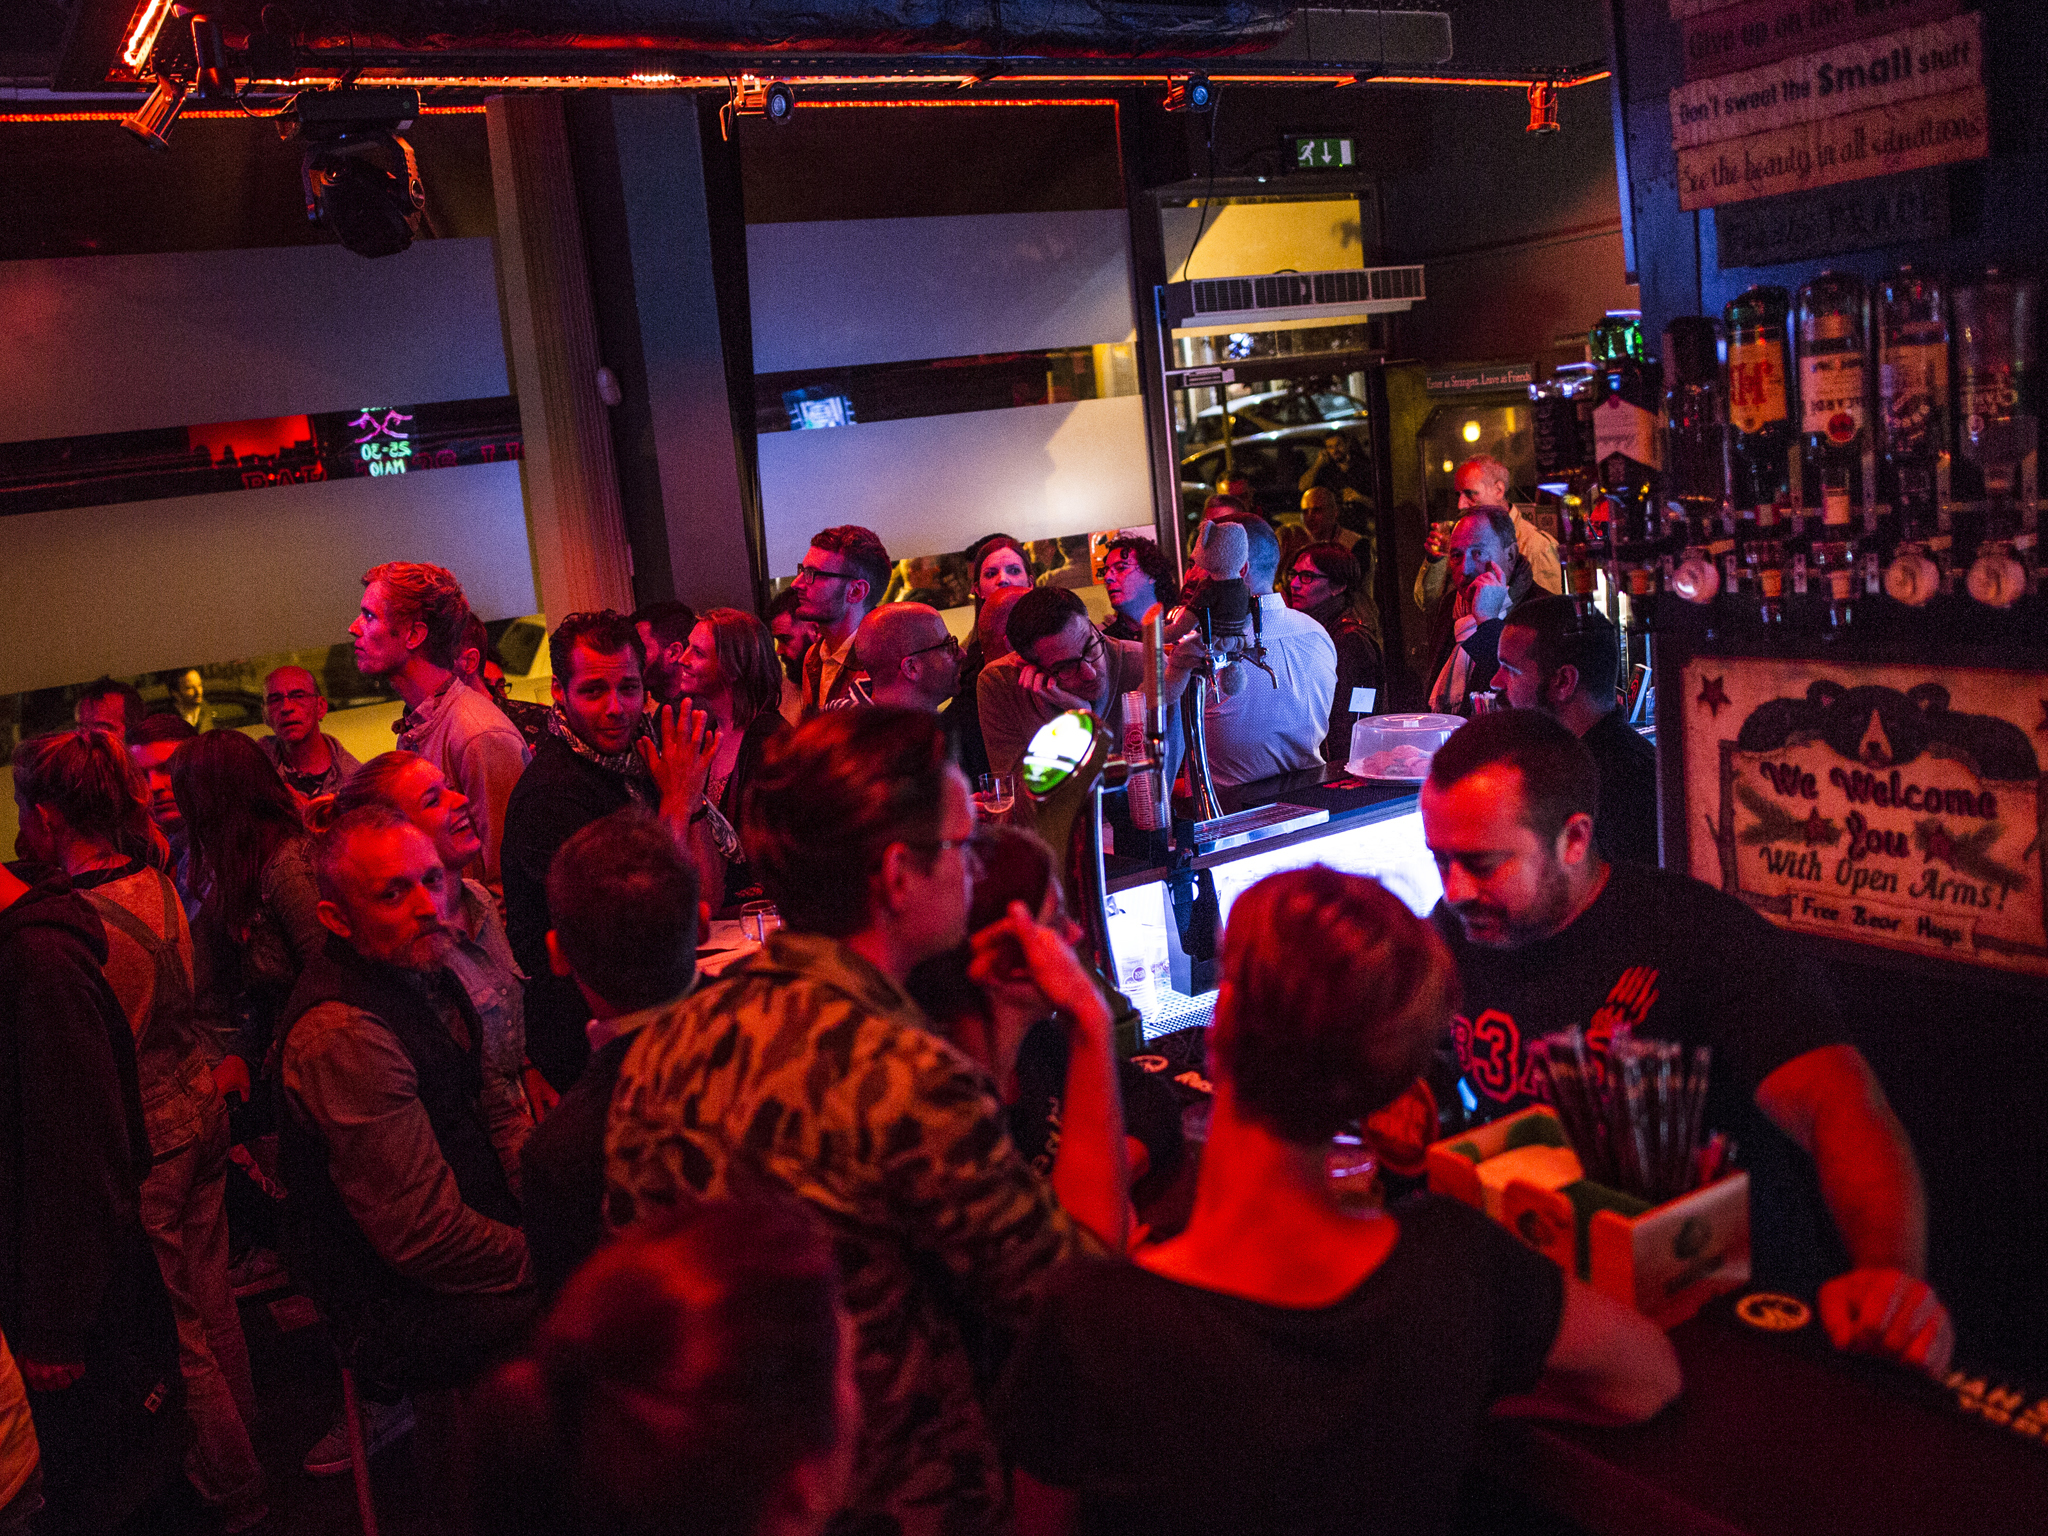 Tr3s Bar